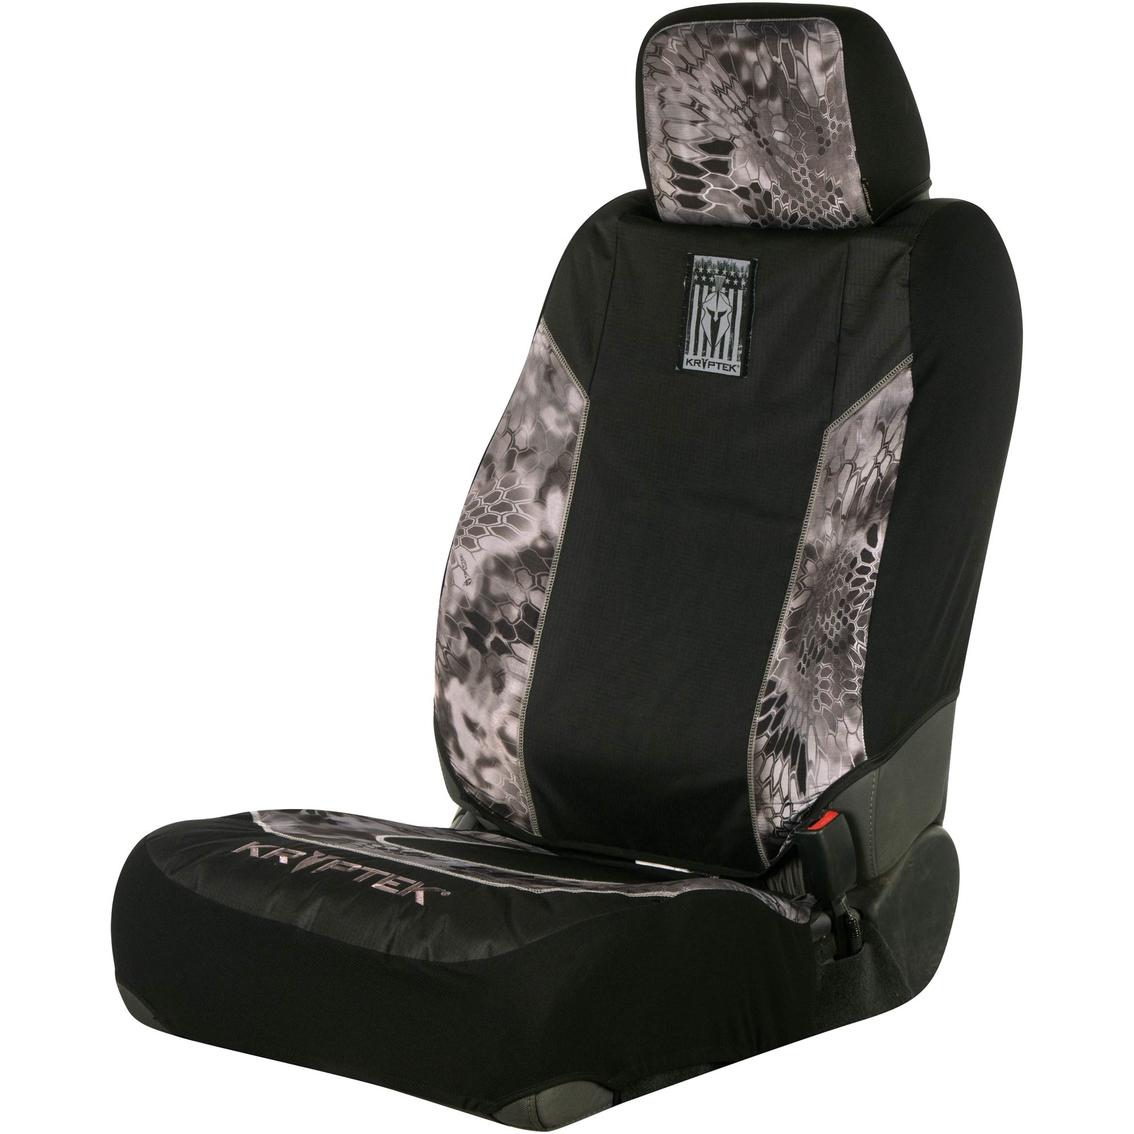 Outstanding Kryptek Patriot Warrior Low Back Seat Cover Saturday Wk Uwap Interior Chair Design Uwaporg